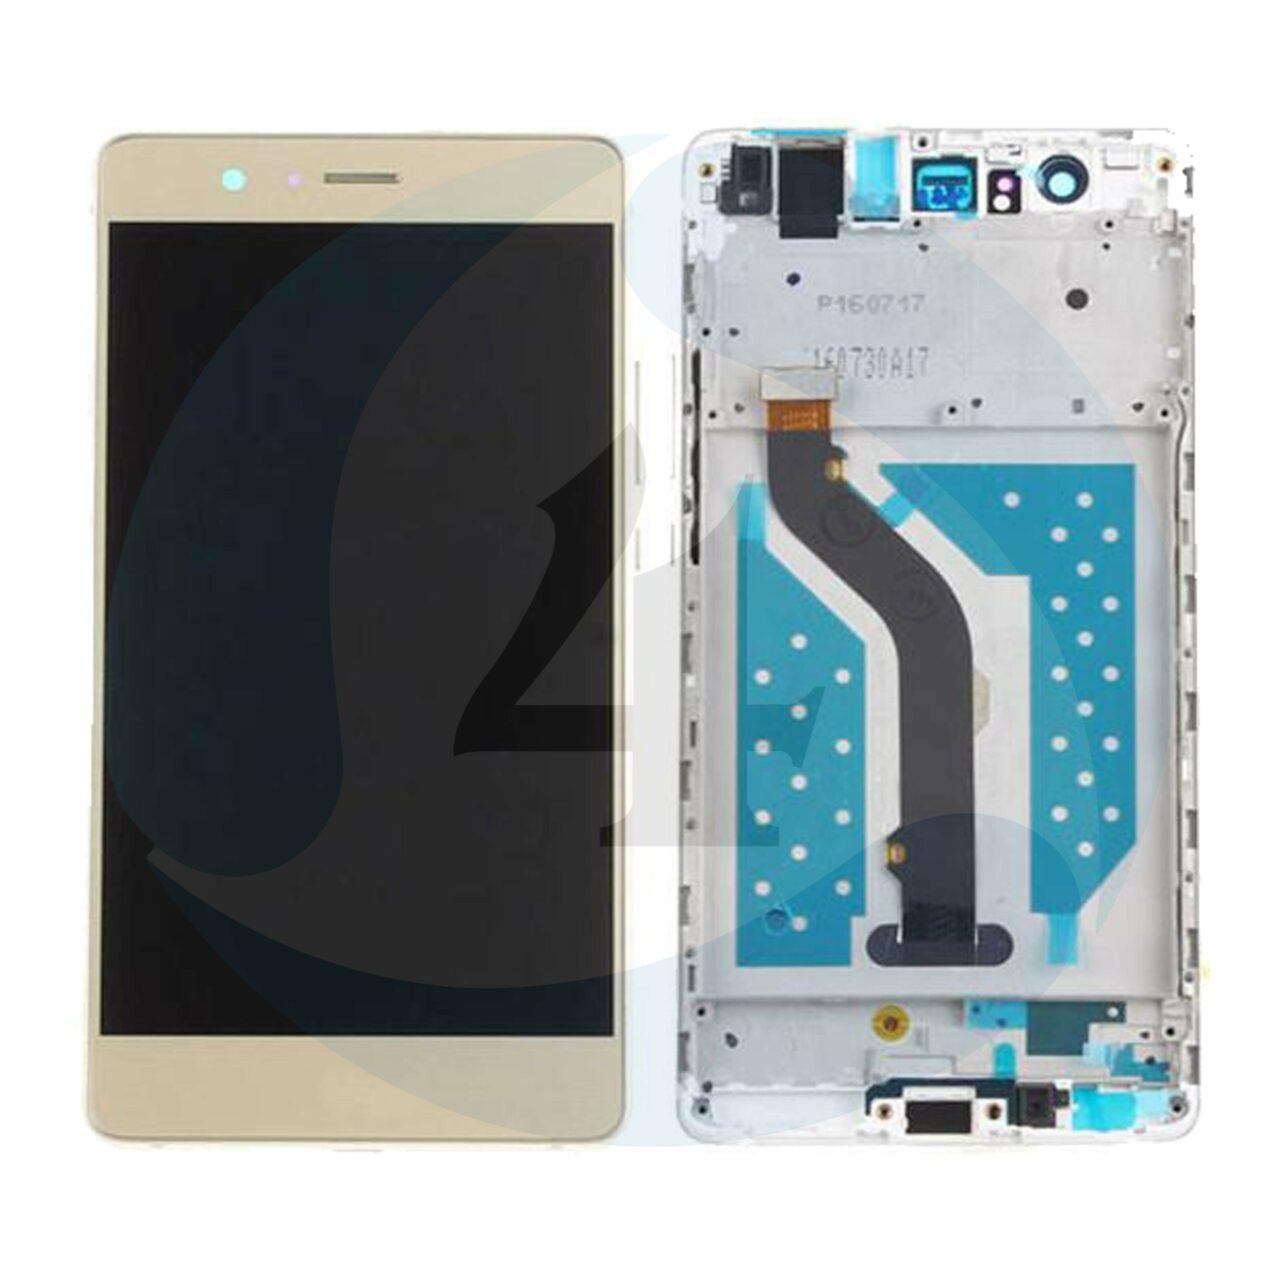 LCD Display Compatible with Xiaomi Mi A2 lite Redmi 6pro Redmi 6 pro schermm